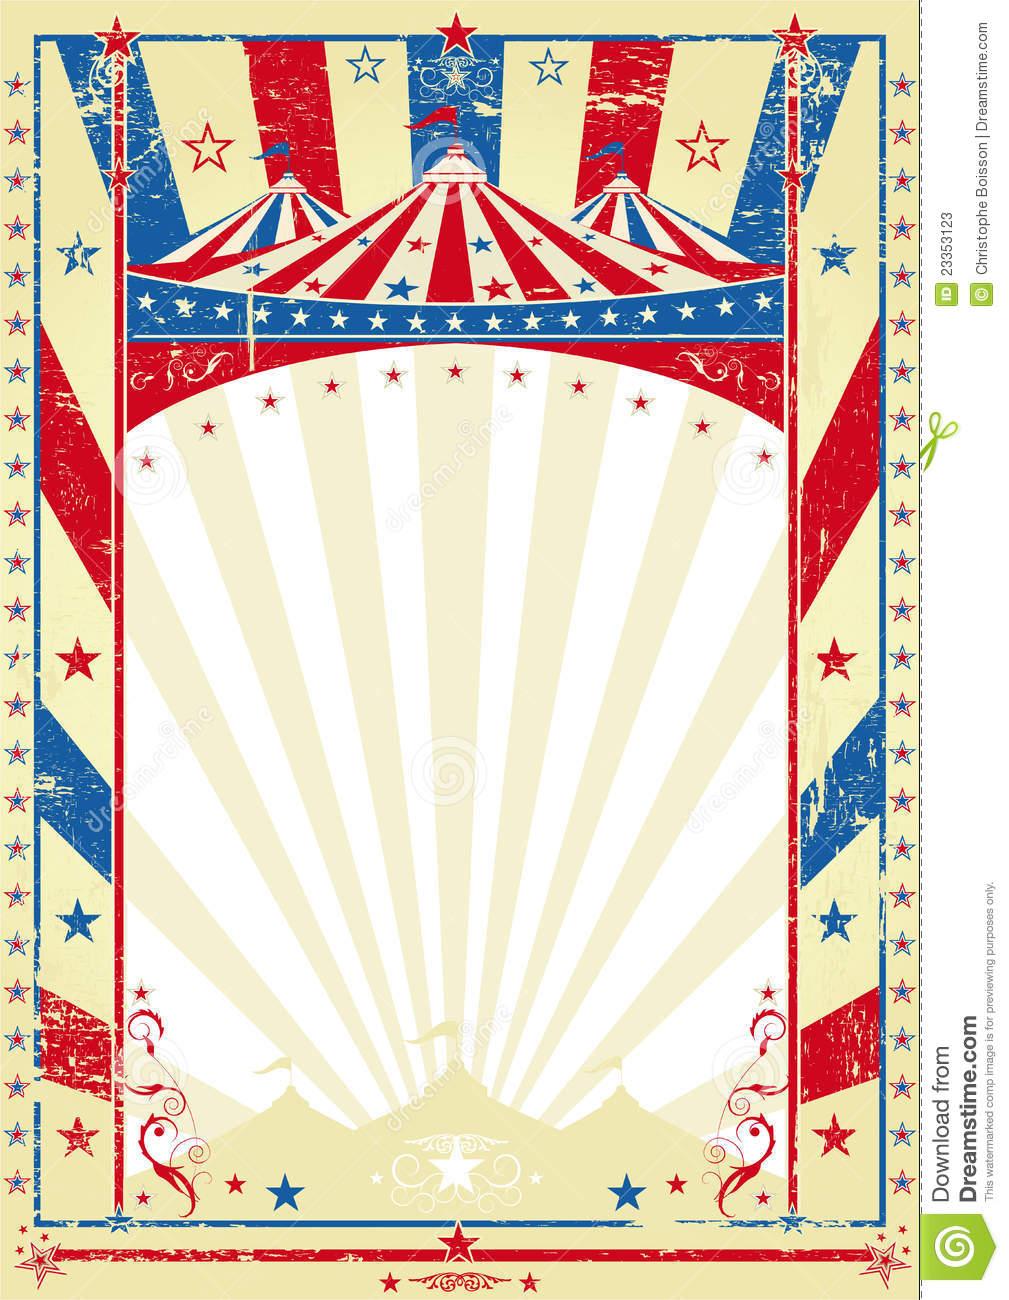 Circus Frame Clipart.